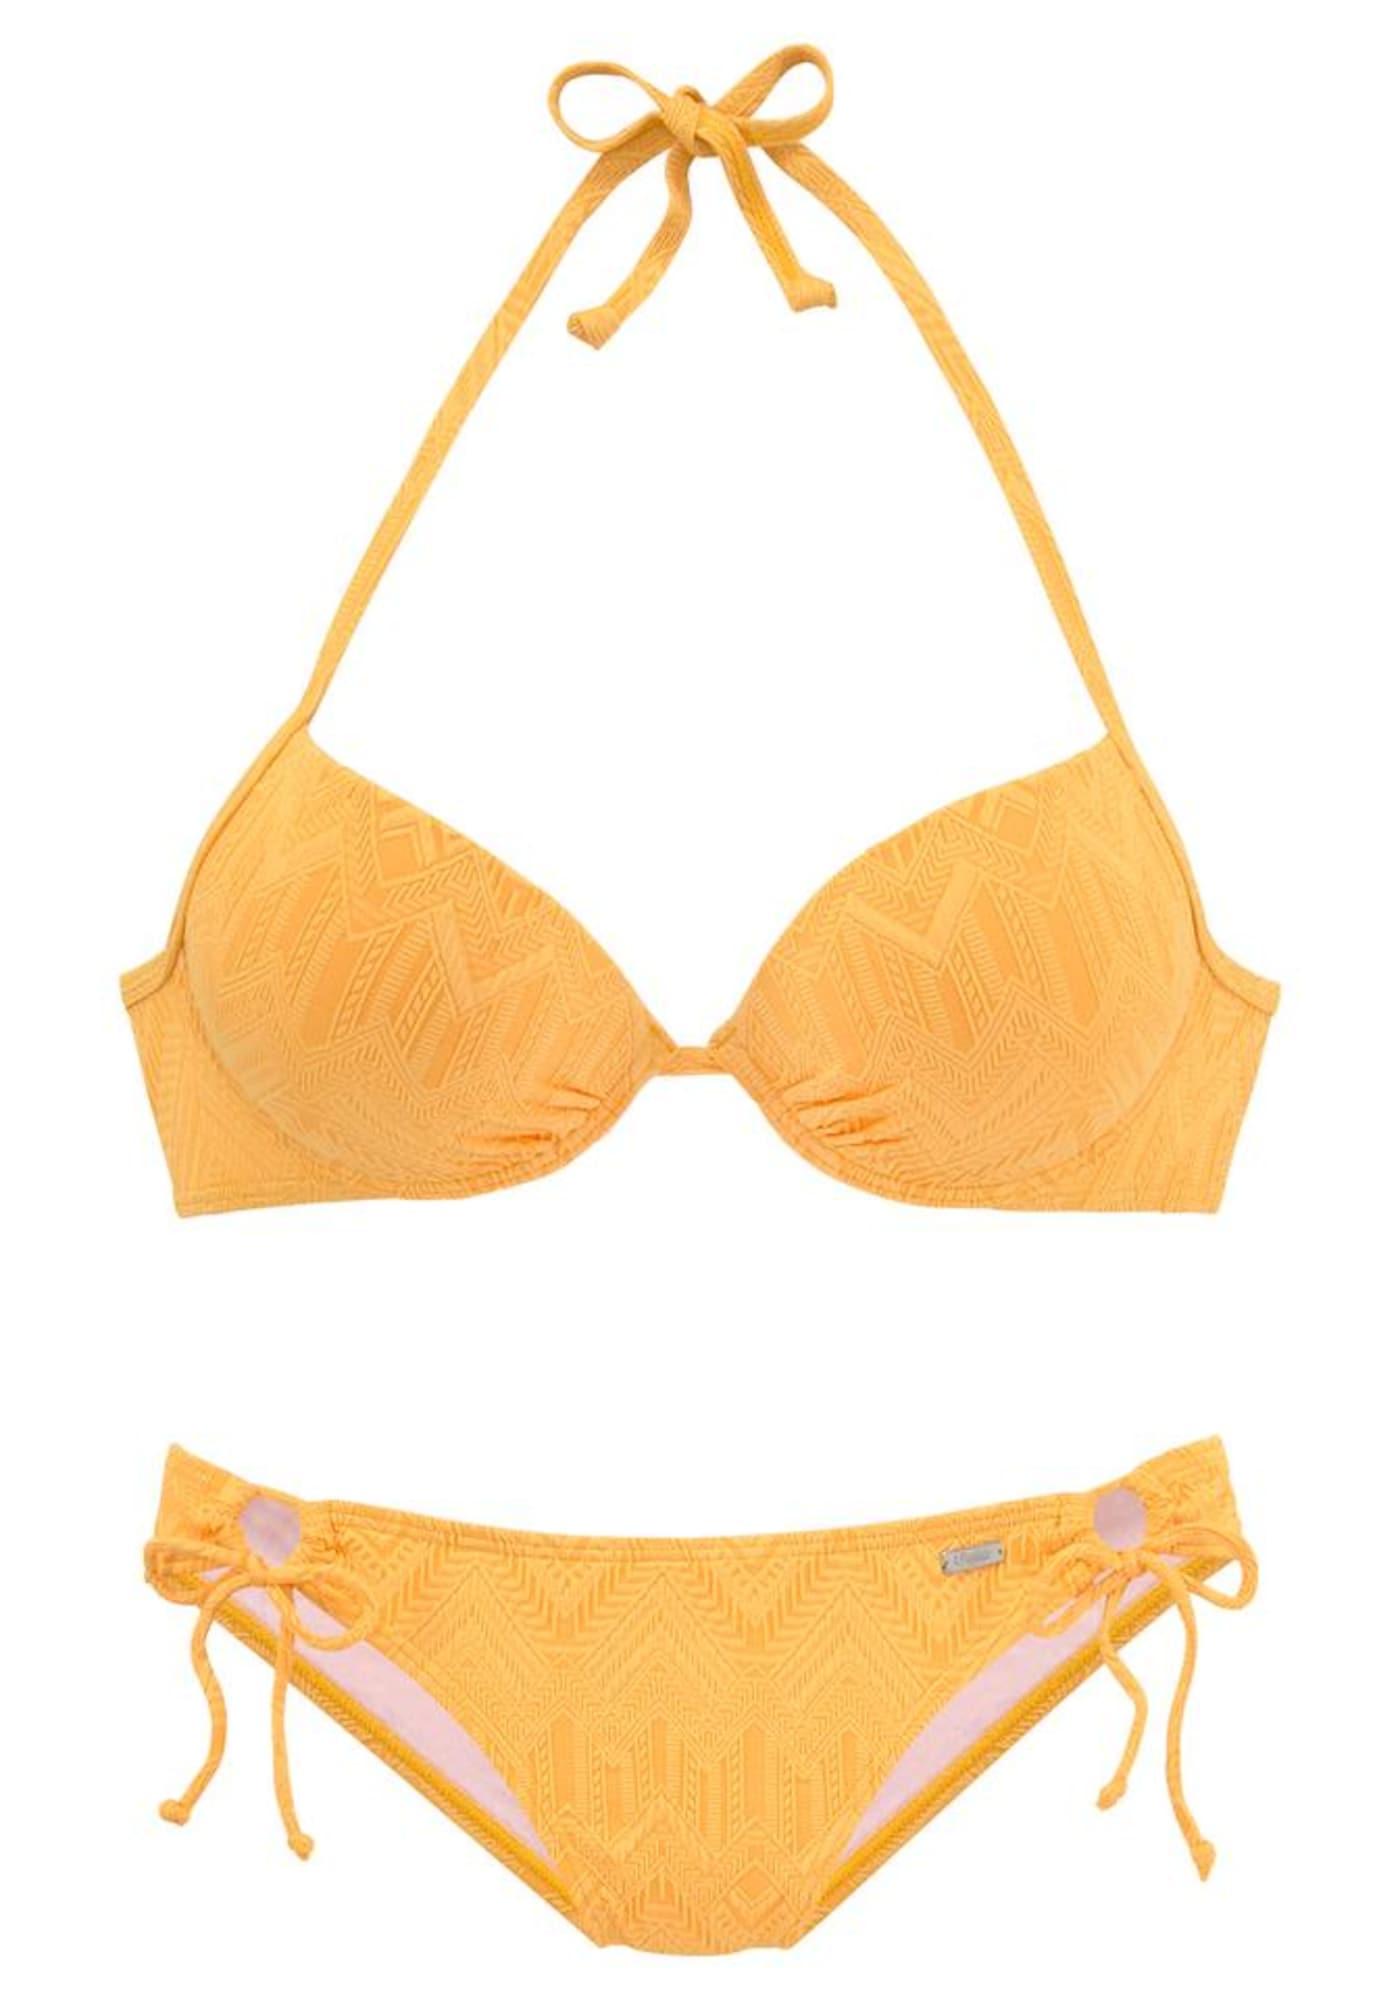 BUFFALO Bikini  - Jaune - Taille: 42 - female